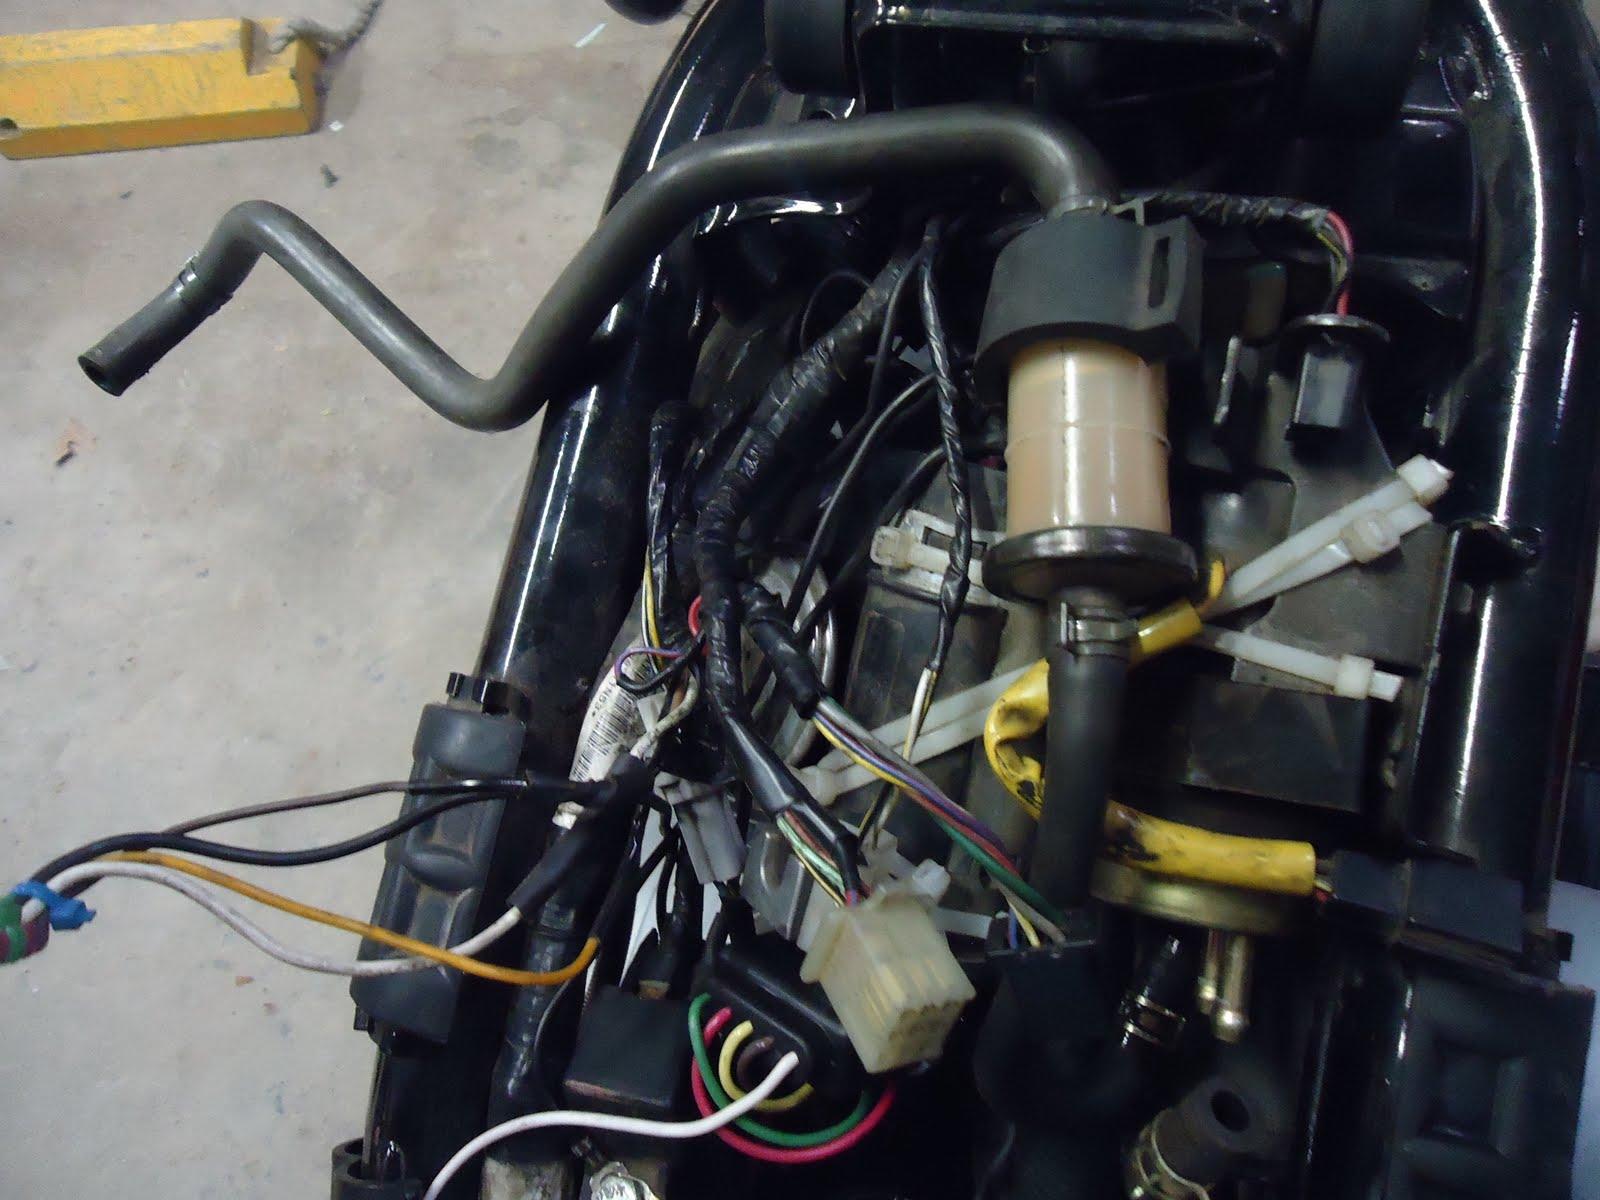 Oo 8840 2001 Kawasaki Vulcan 1500 Wiring Diagram Schematic Free Diagram